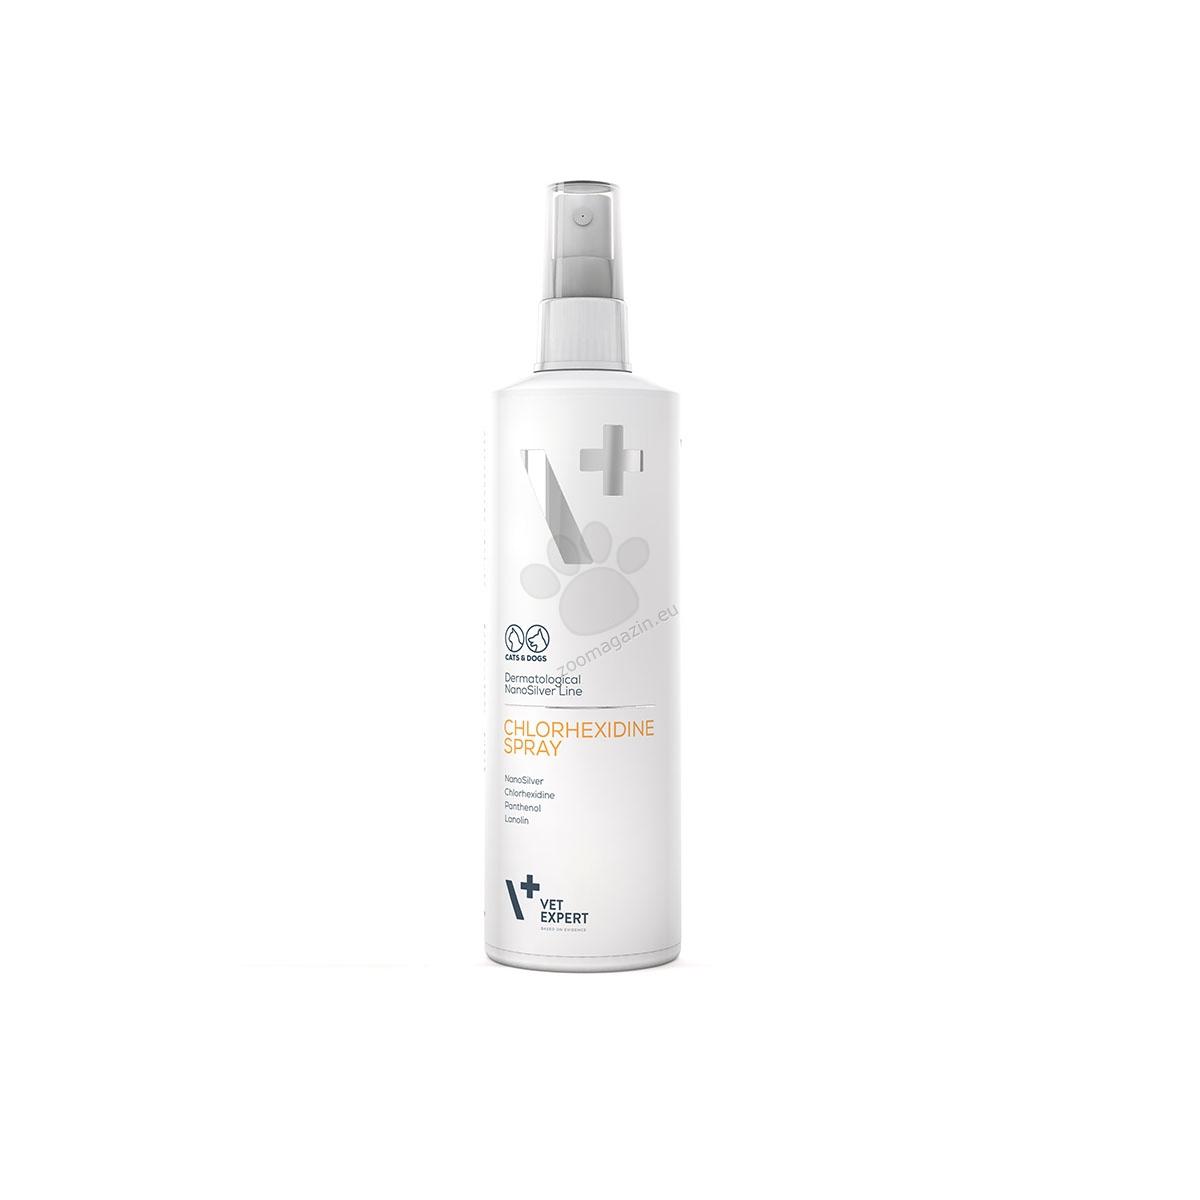 Vetexpert - Dermatological NanoSilver Line - Chlorhexidine - Hot Spot - за локална употреба при кучета и котки с кожни лезии 100 мл.